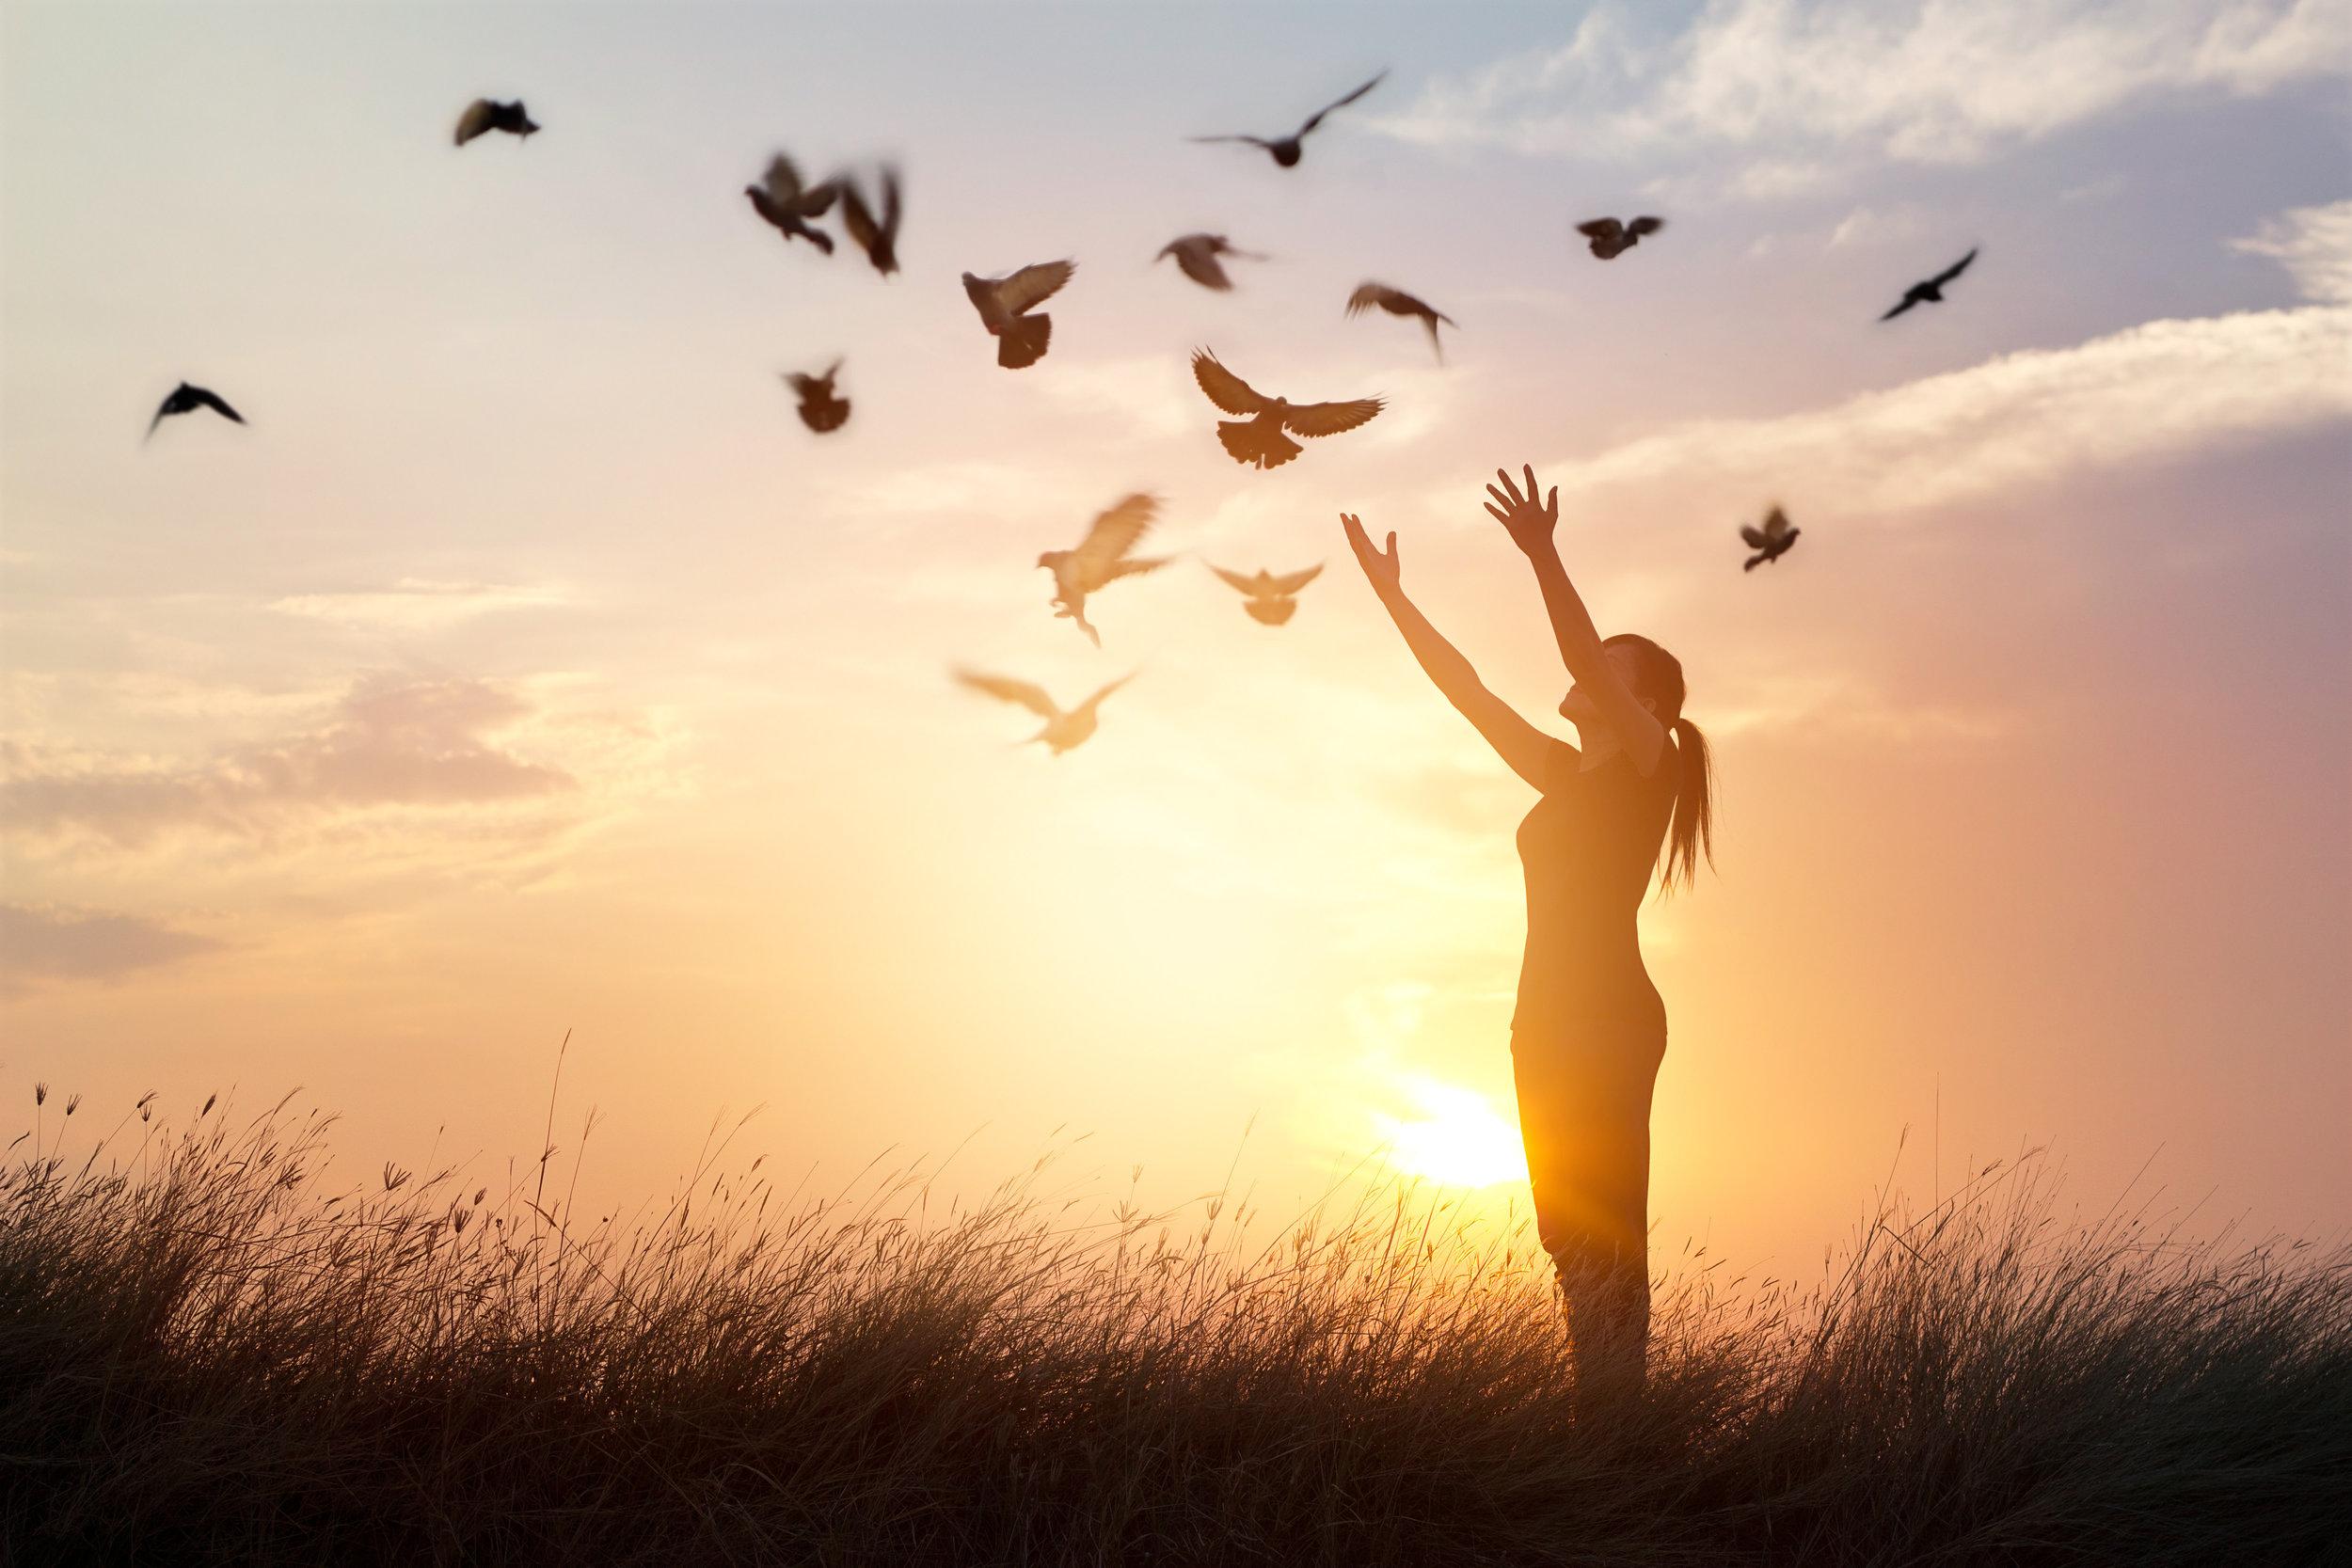 Woman praying and free bird enjoying nature on sunset background, hope concept_.jpg